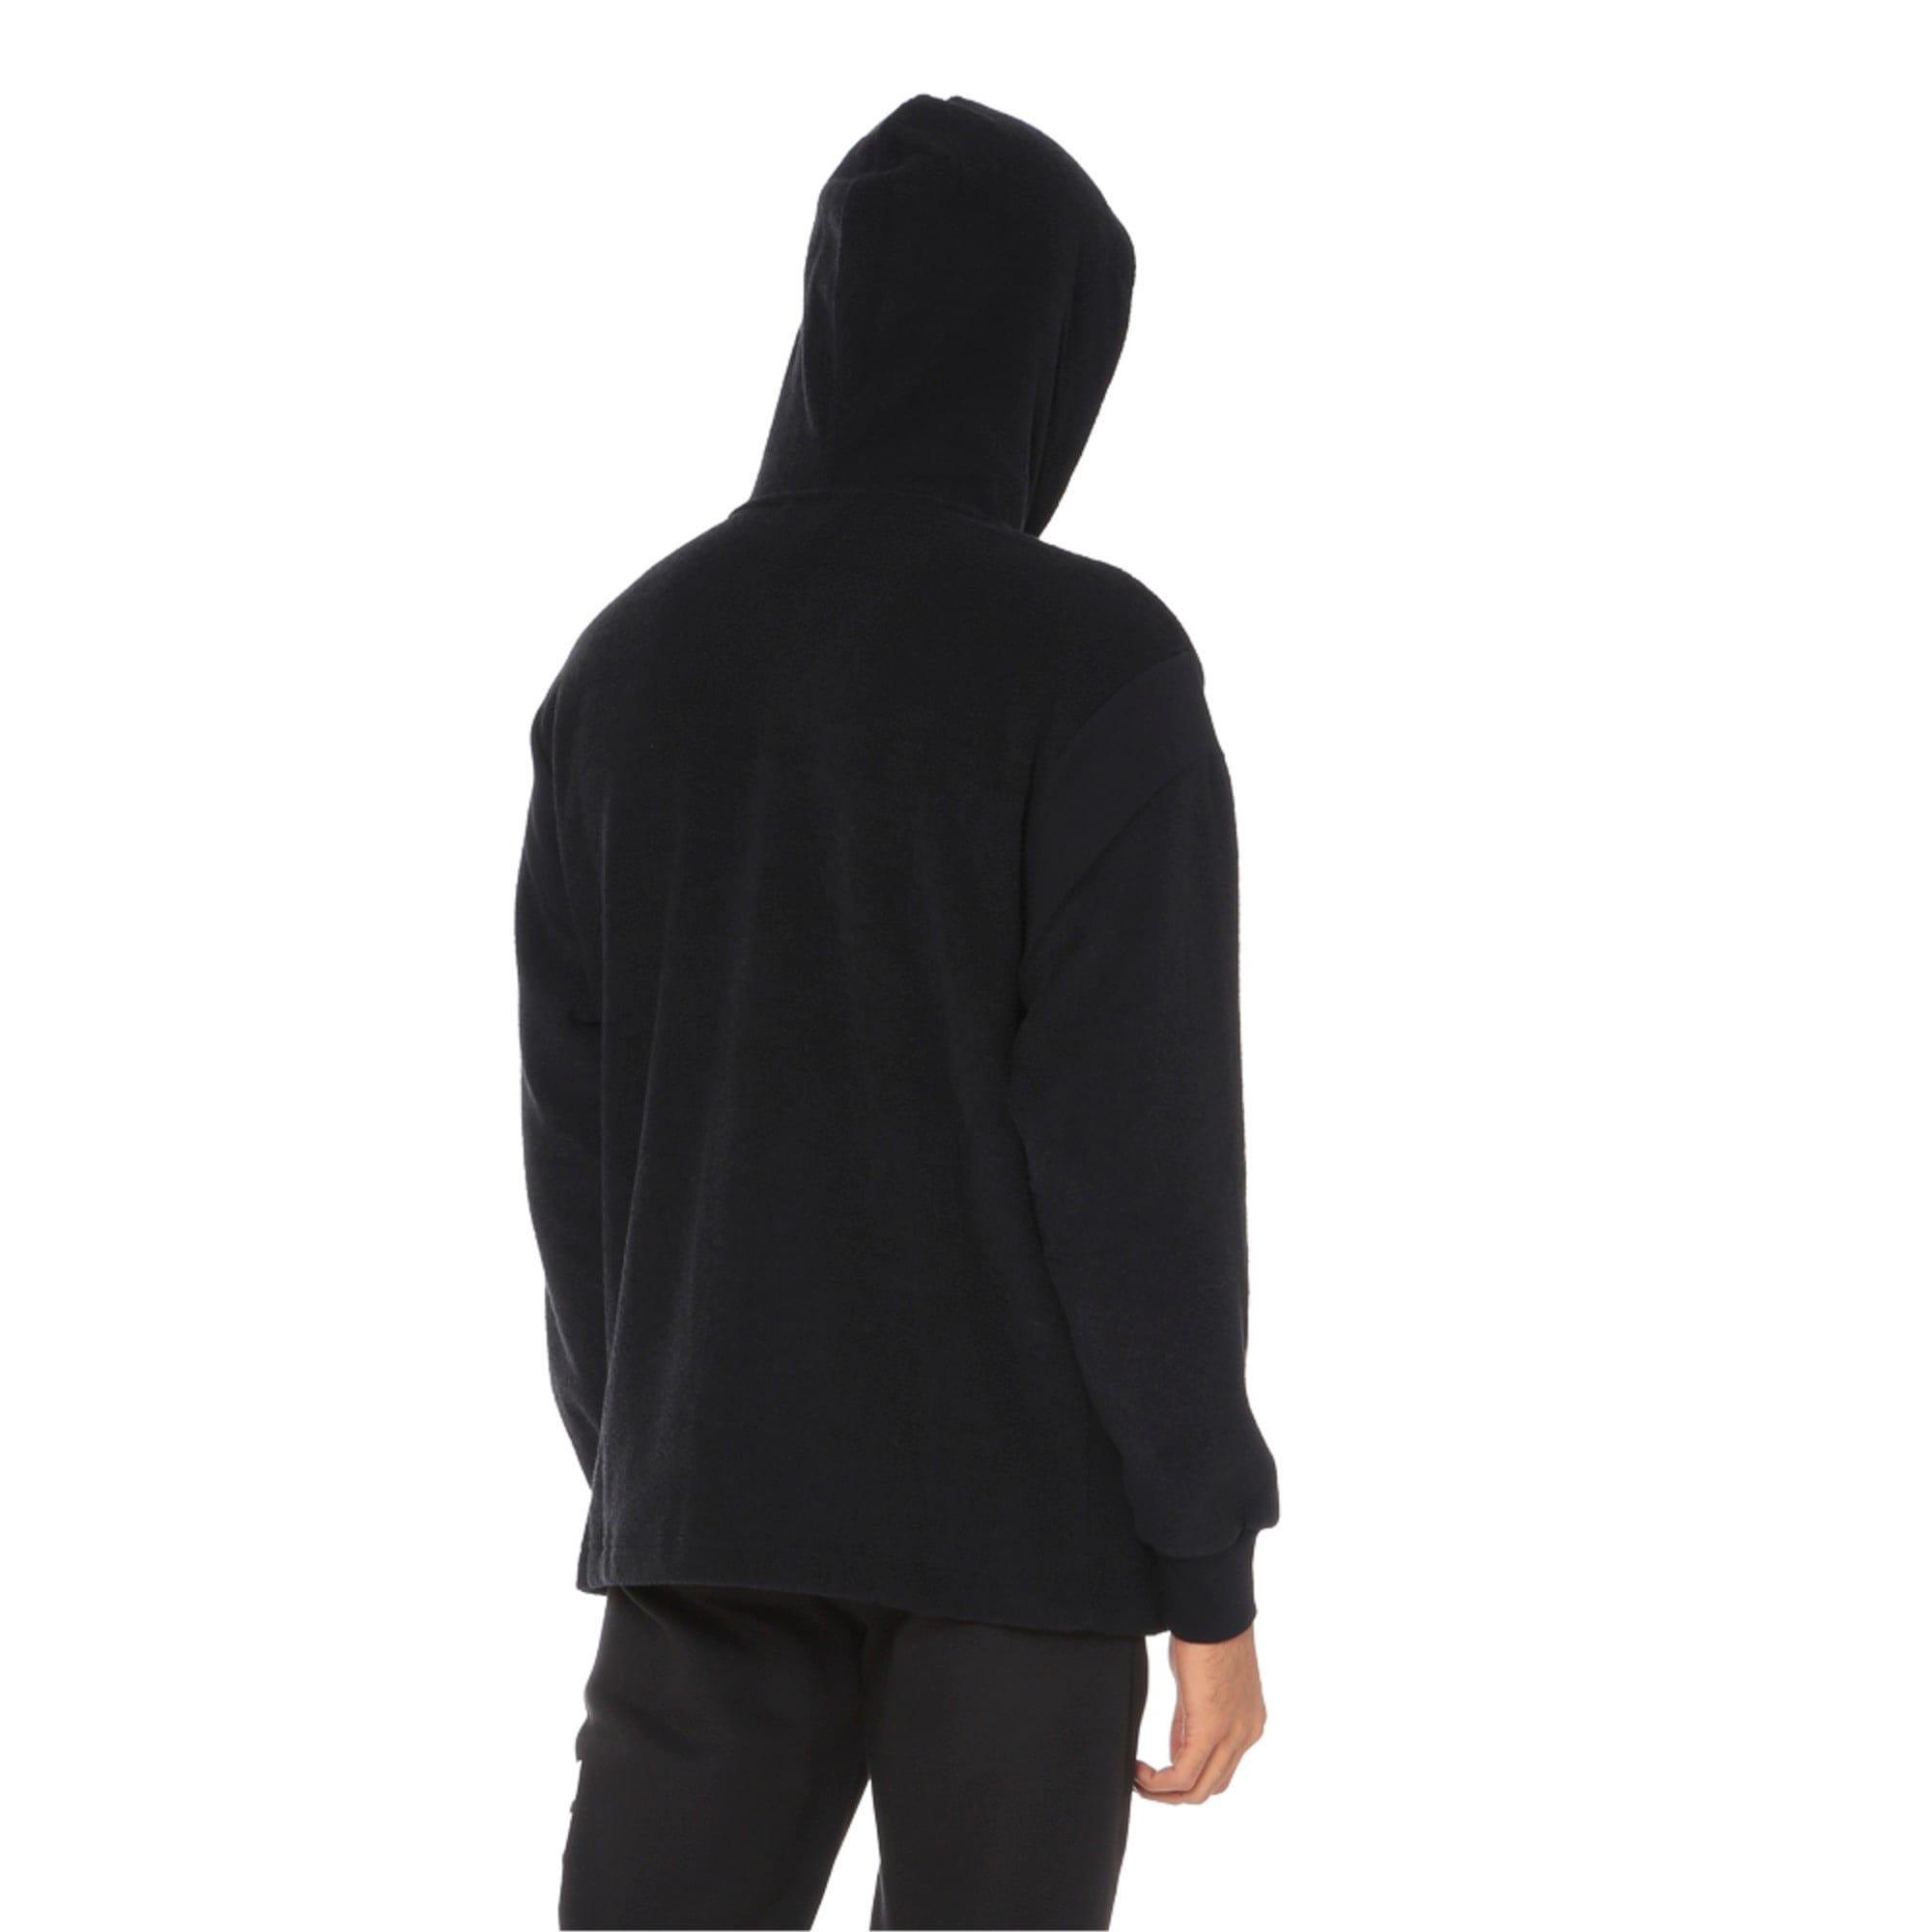 Thumbnail 2 of Fusion Fleece Hooded Men's Sweat Jacket, Puma Black, medium-IND